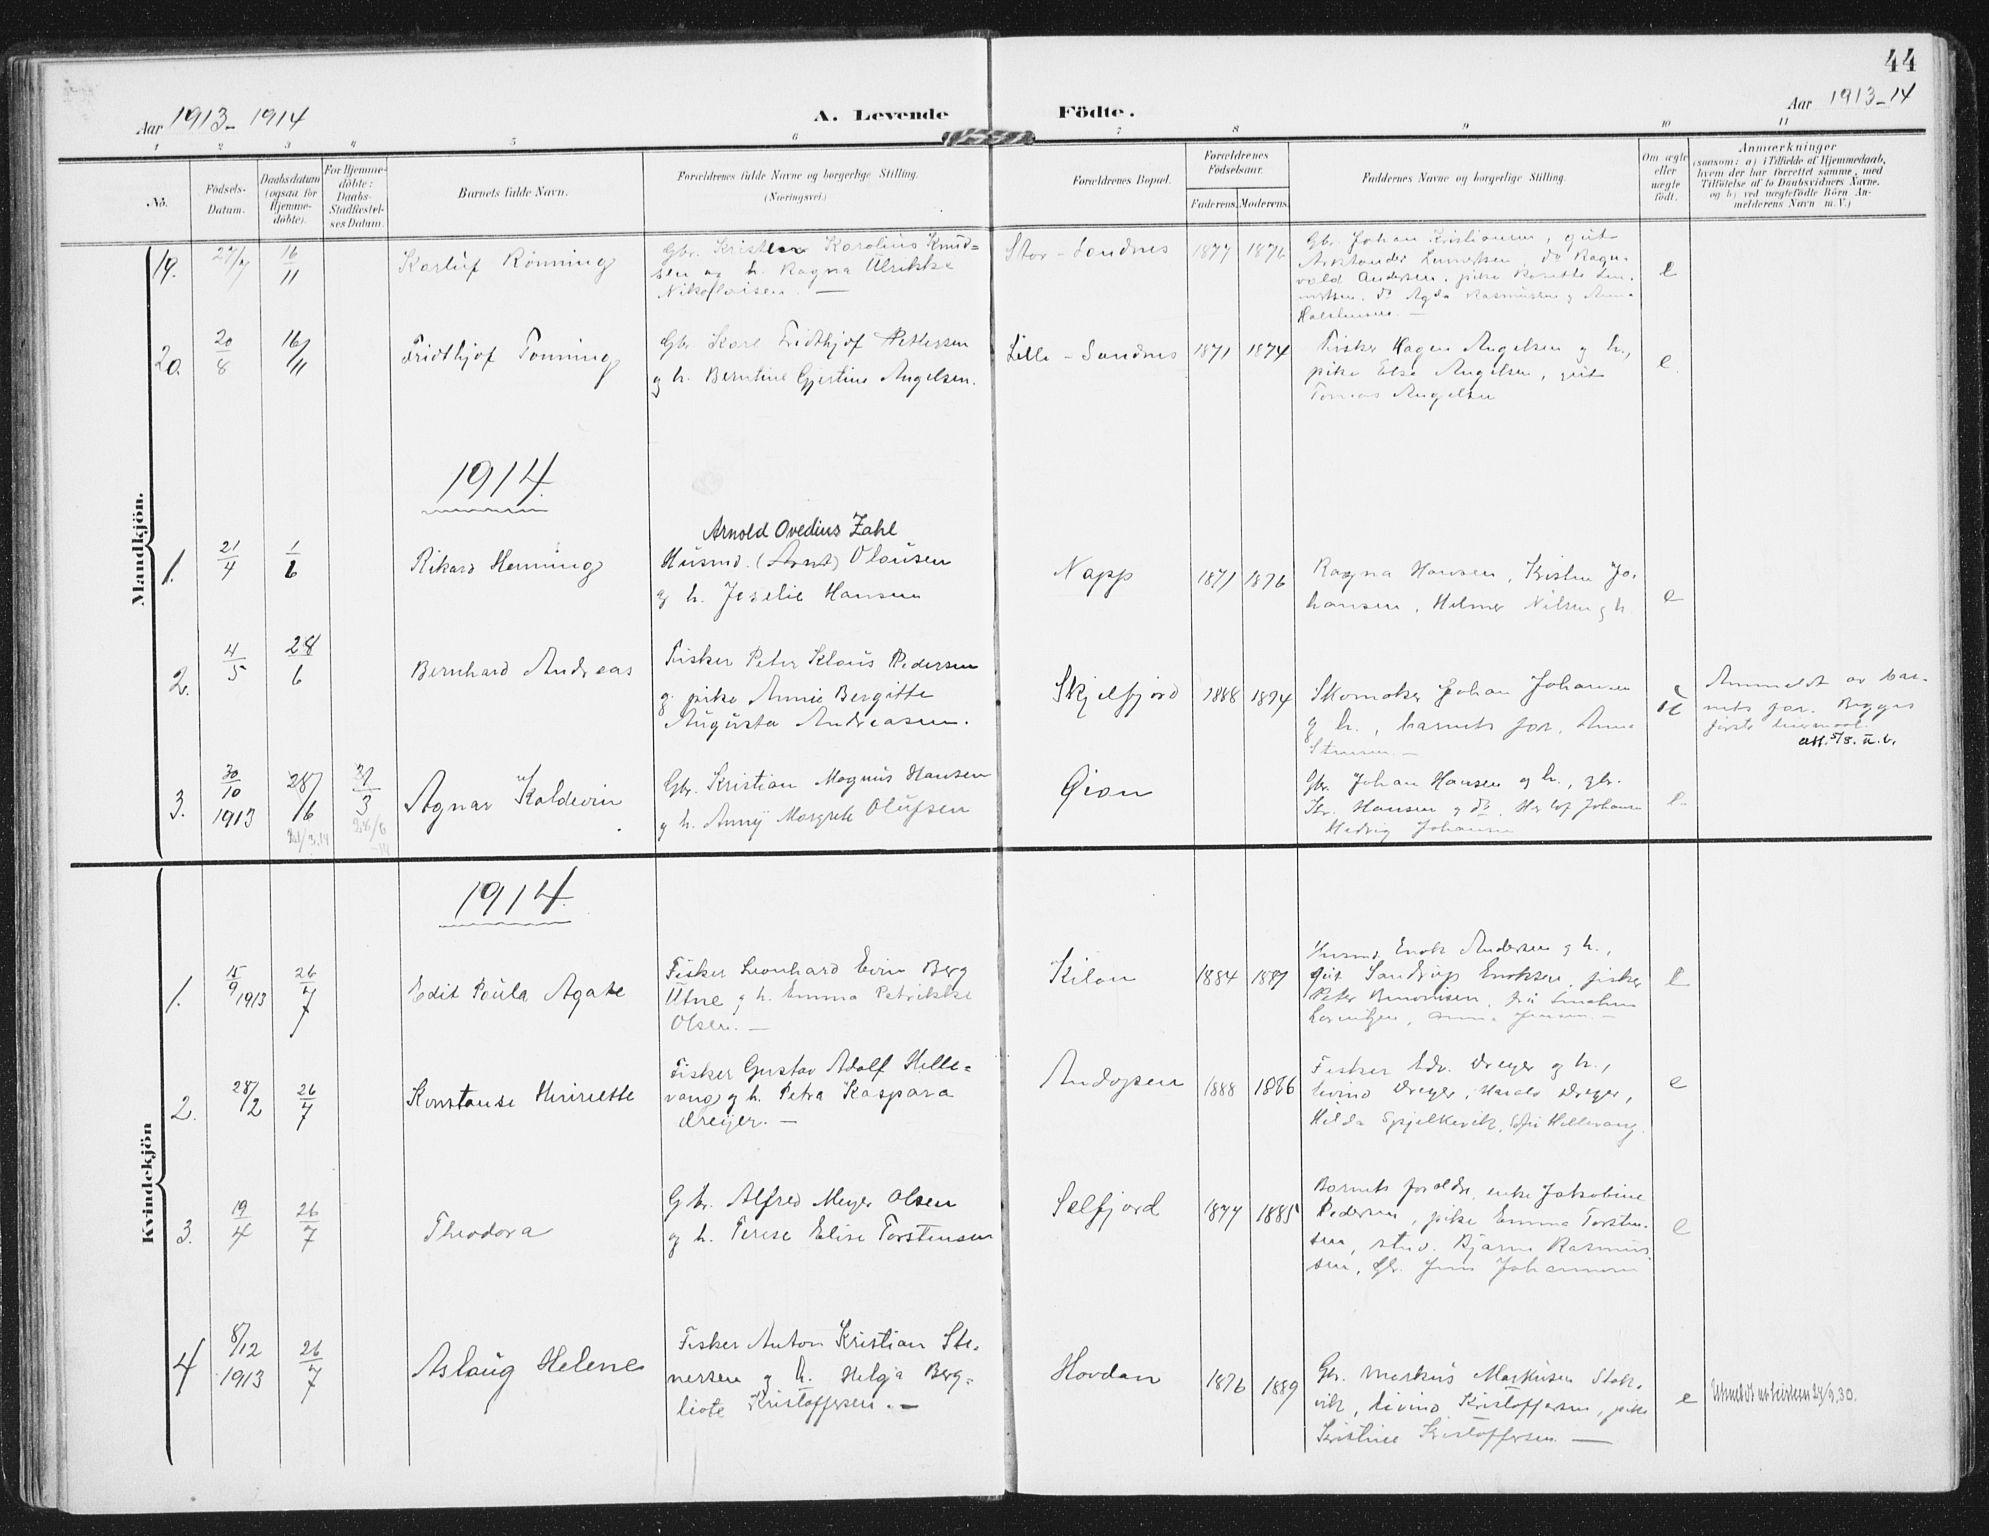 SAT, Ministerialprotokoller, klokkerbøker og fødselsregistre - Nordland, 885/L1206: Ministerialbok nr. 885A07, 1905-1915, s. 44